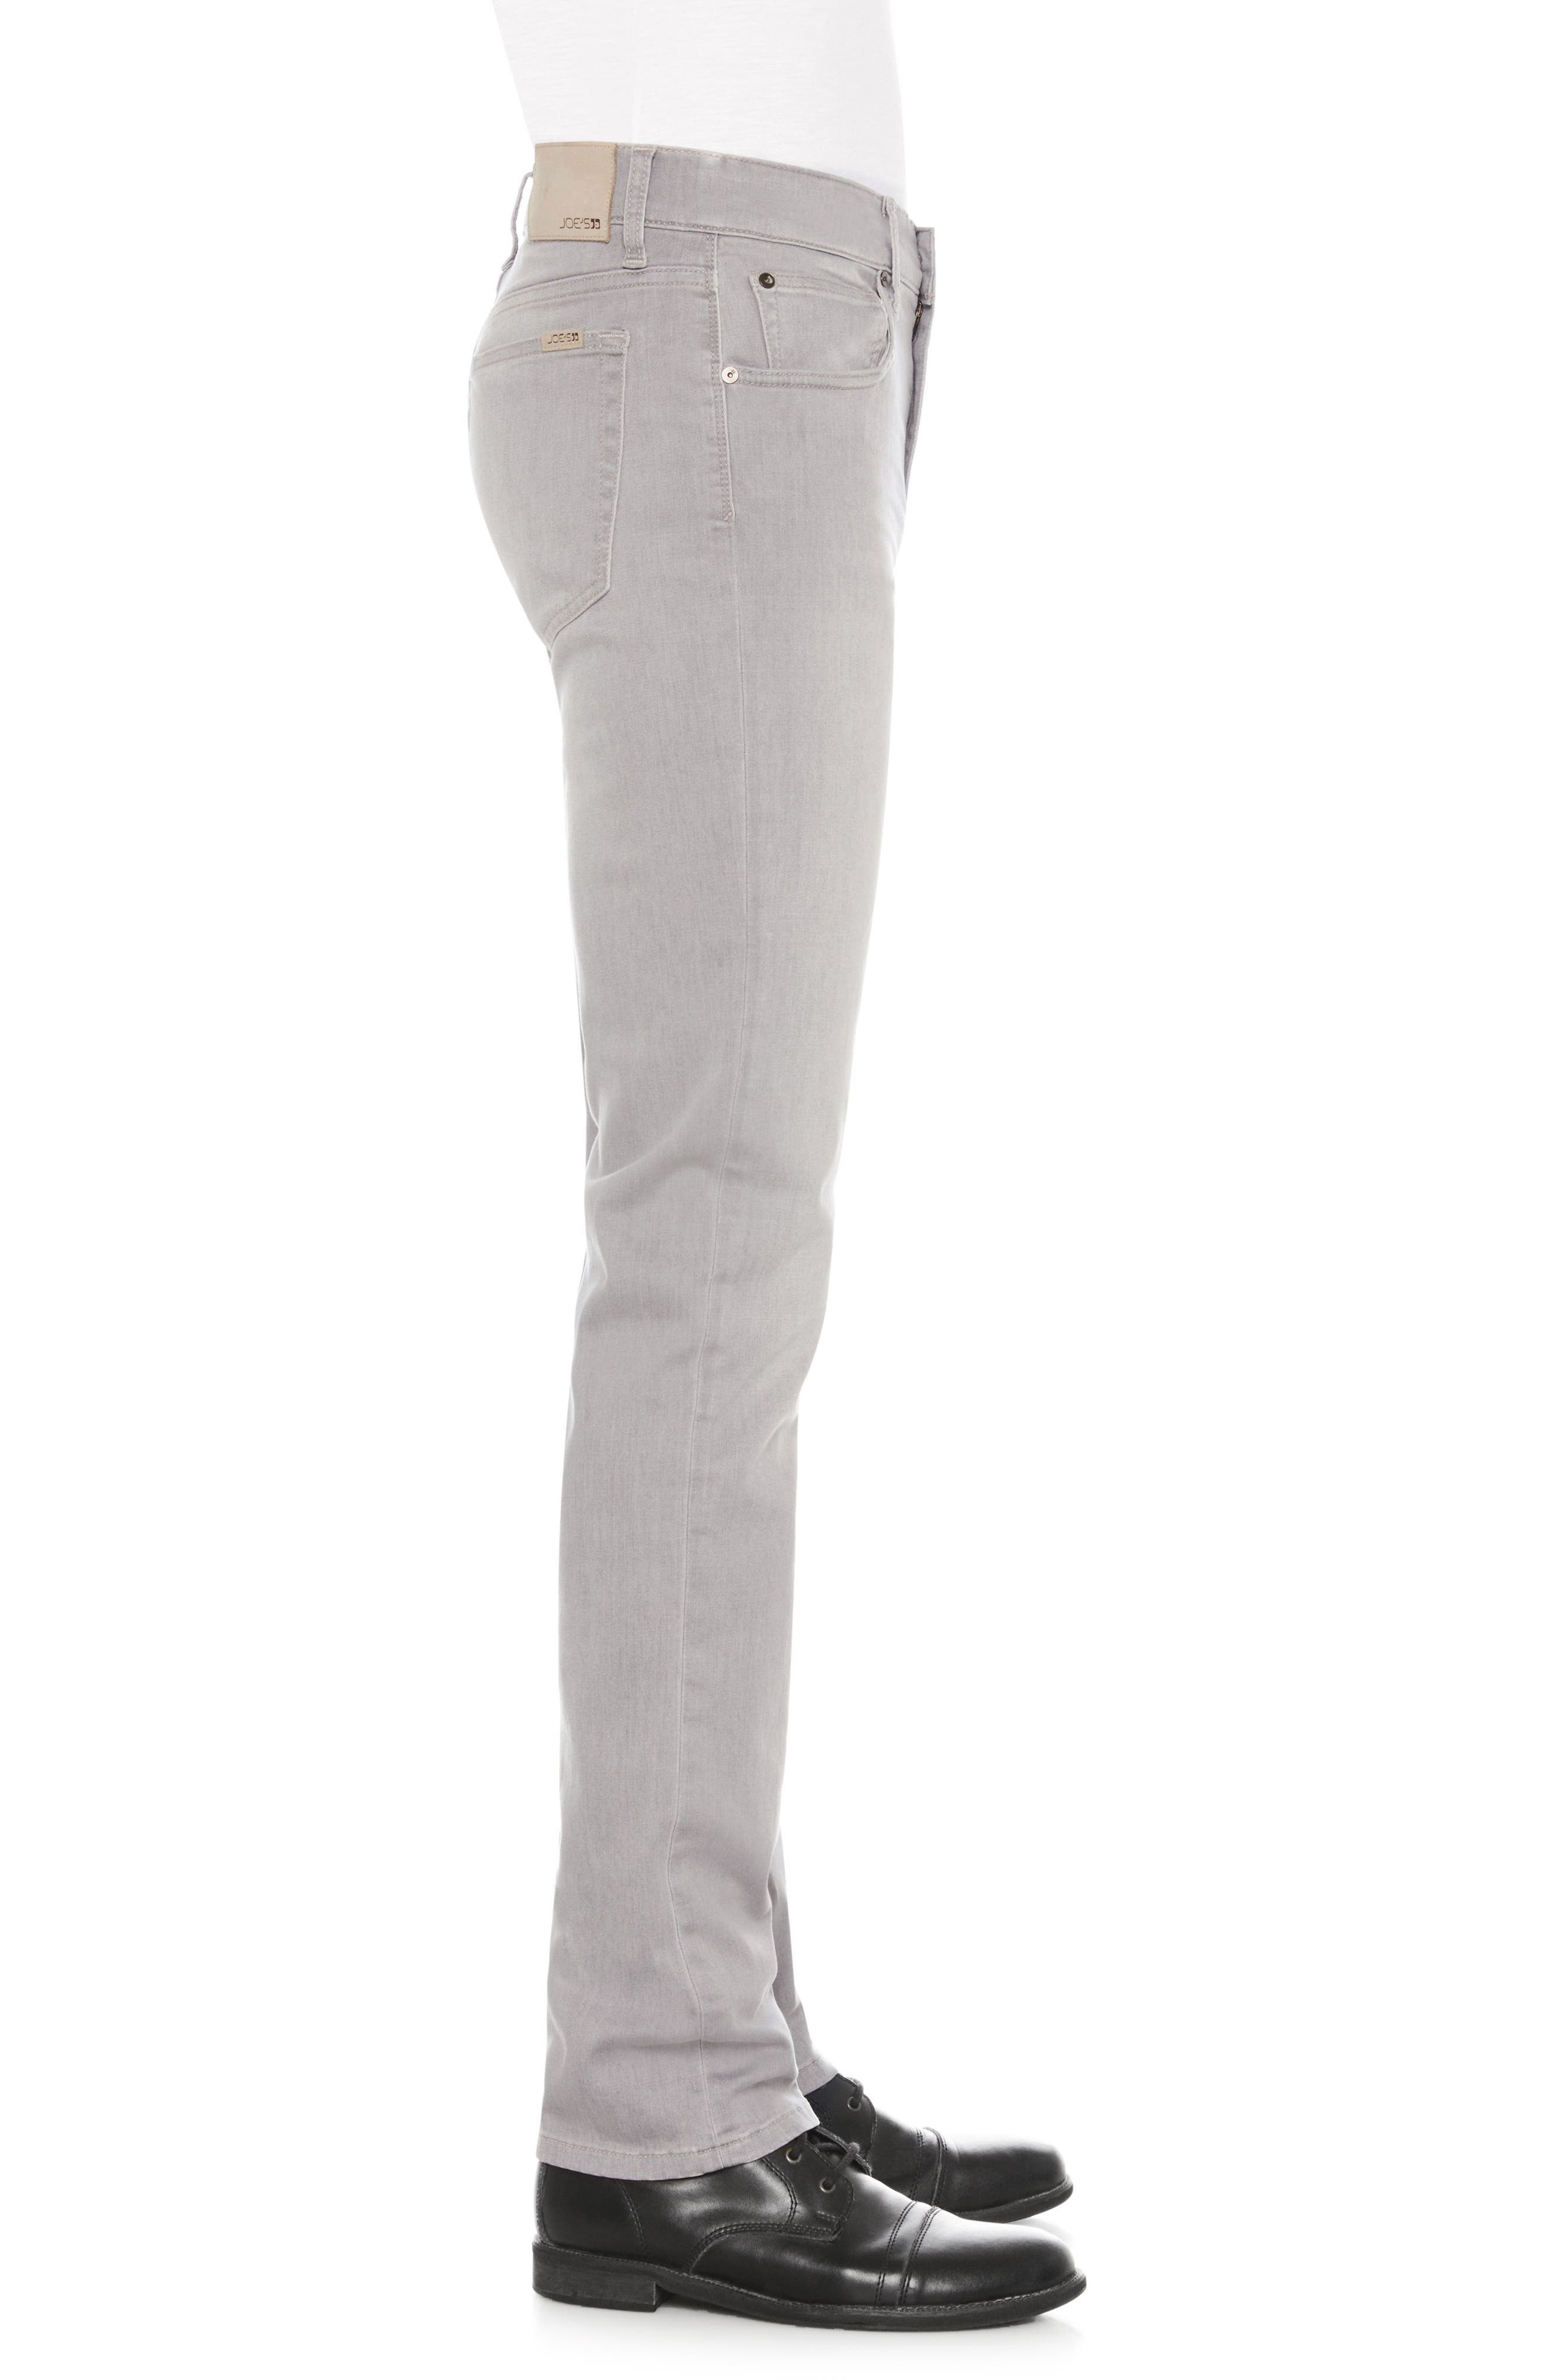 Brixton Slim Straight Fit Jeans,                             Alternate thumbnail 3, color,                             050